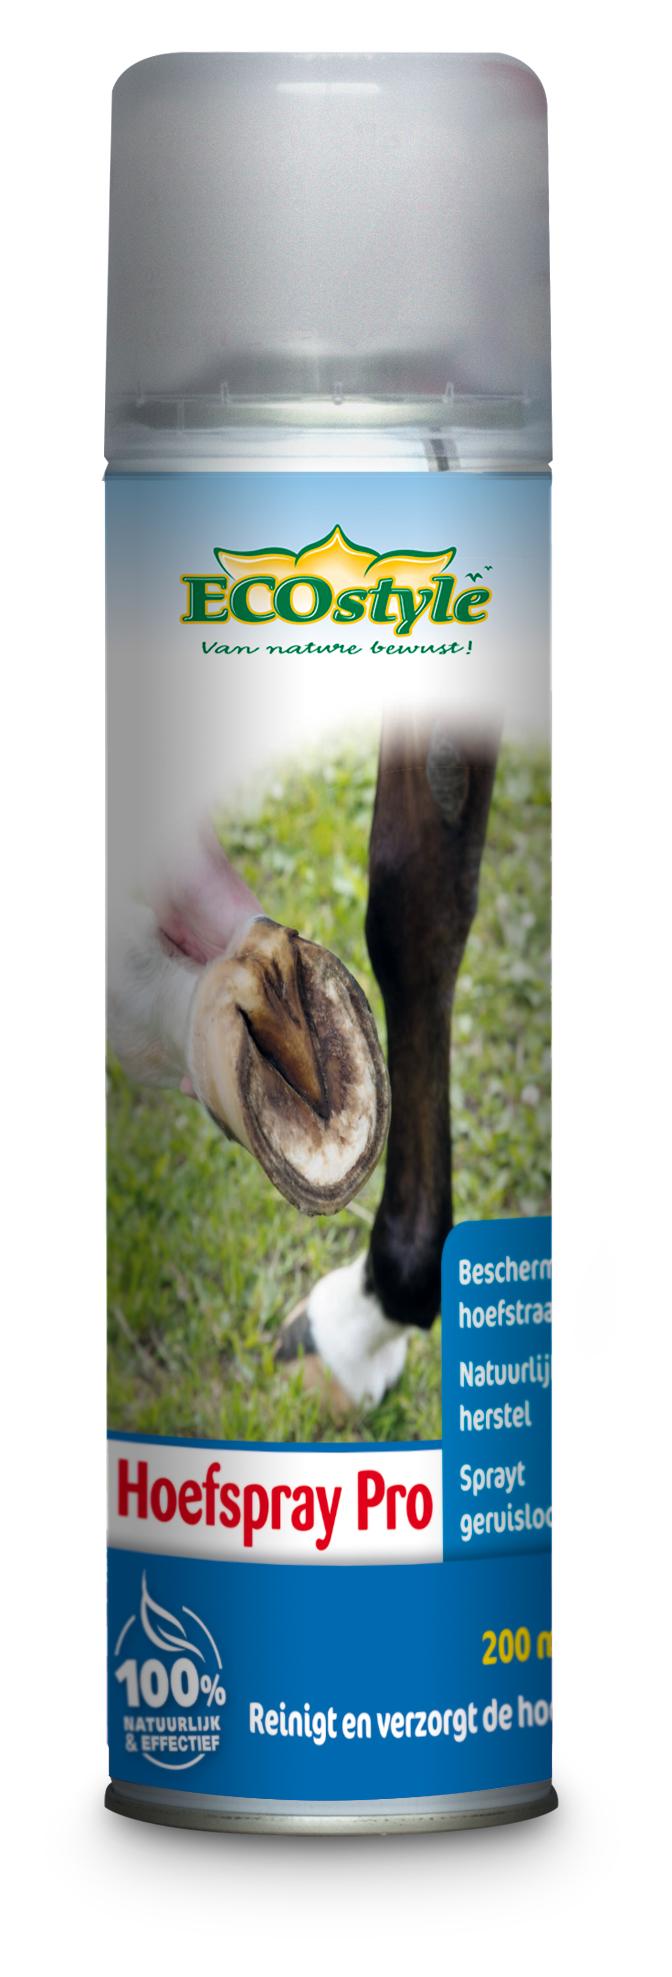 Sectolin Hoefspray Pro - Ecostyle 200 ml